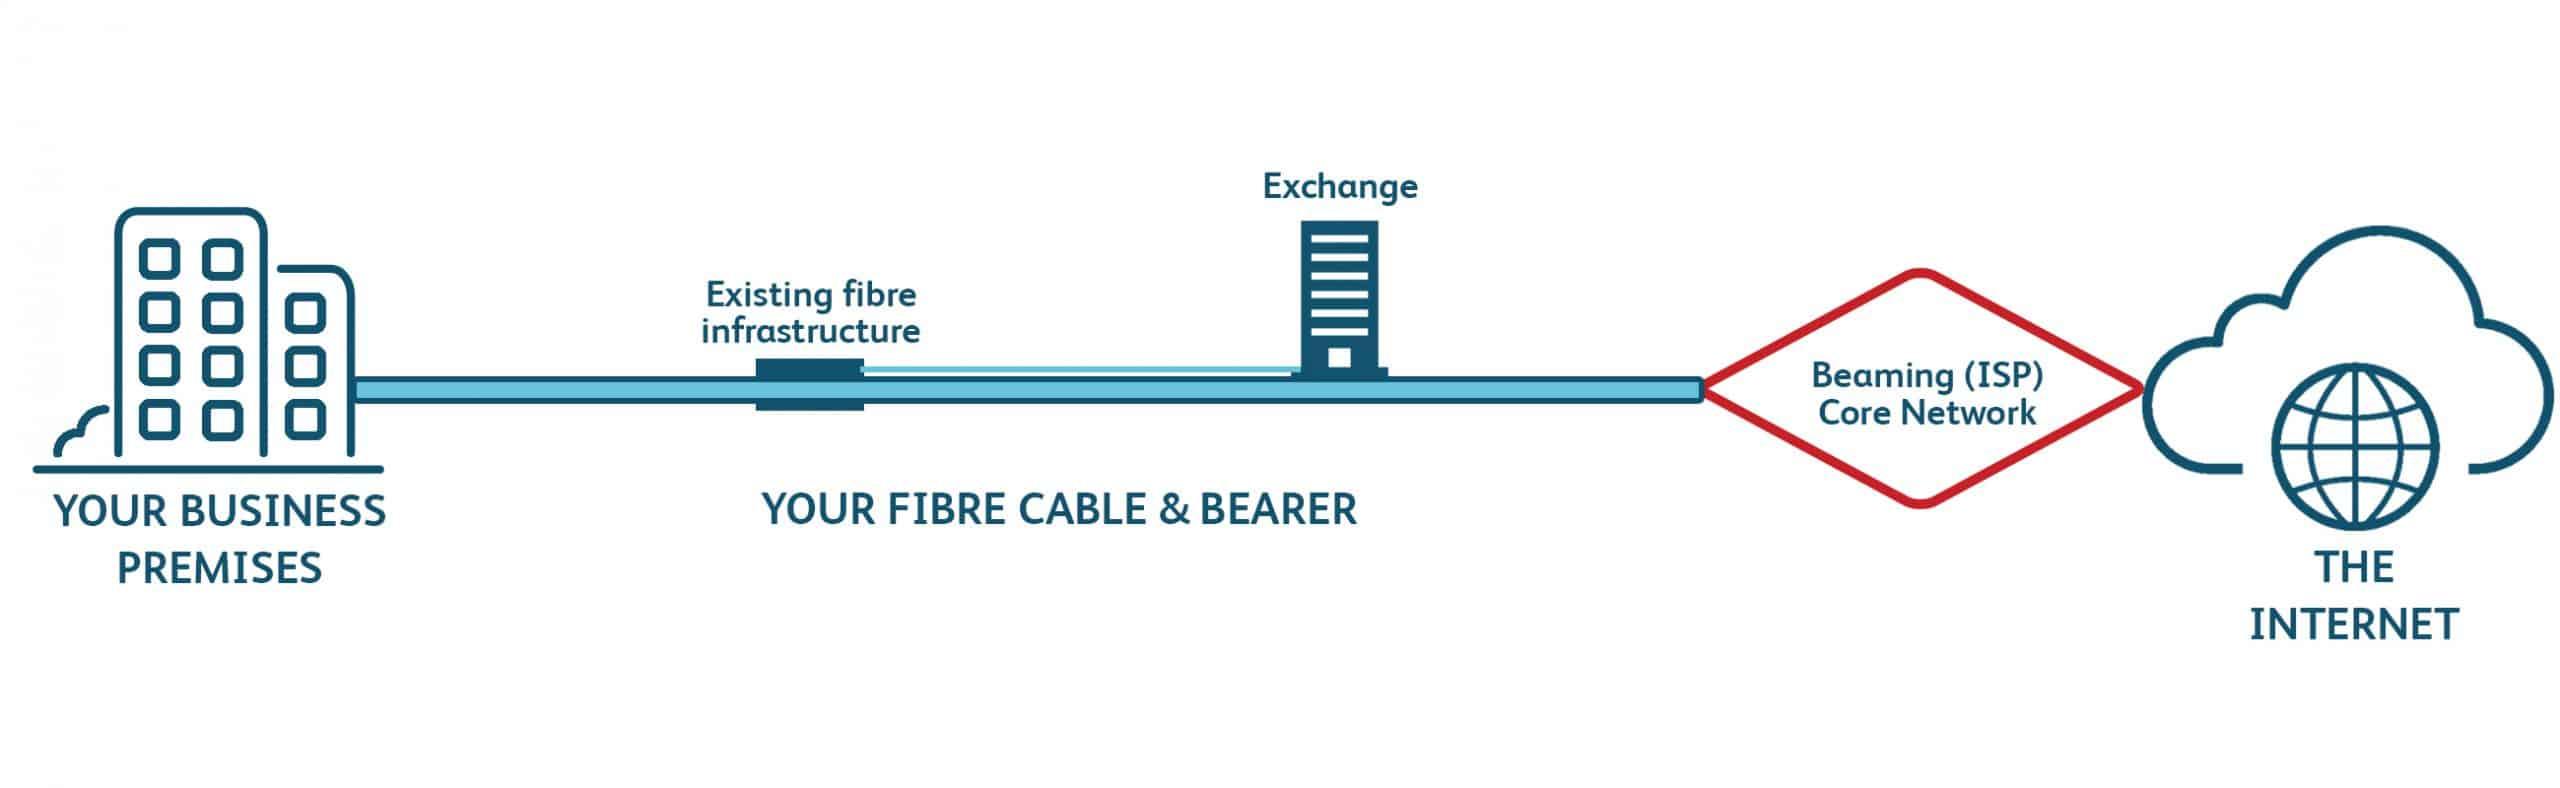 Leased line price diagram